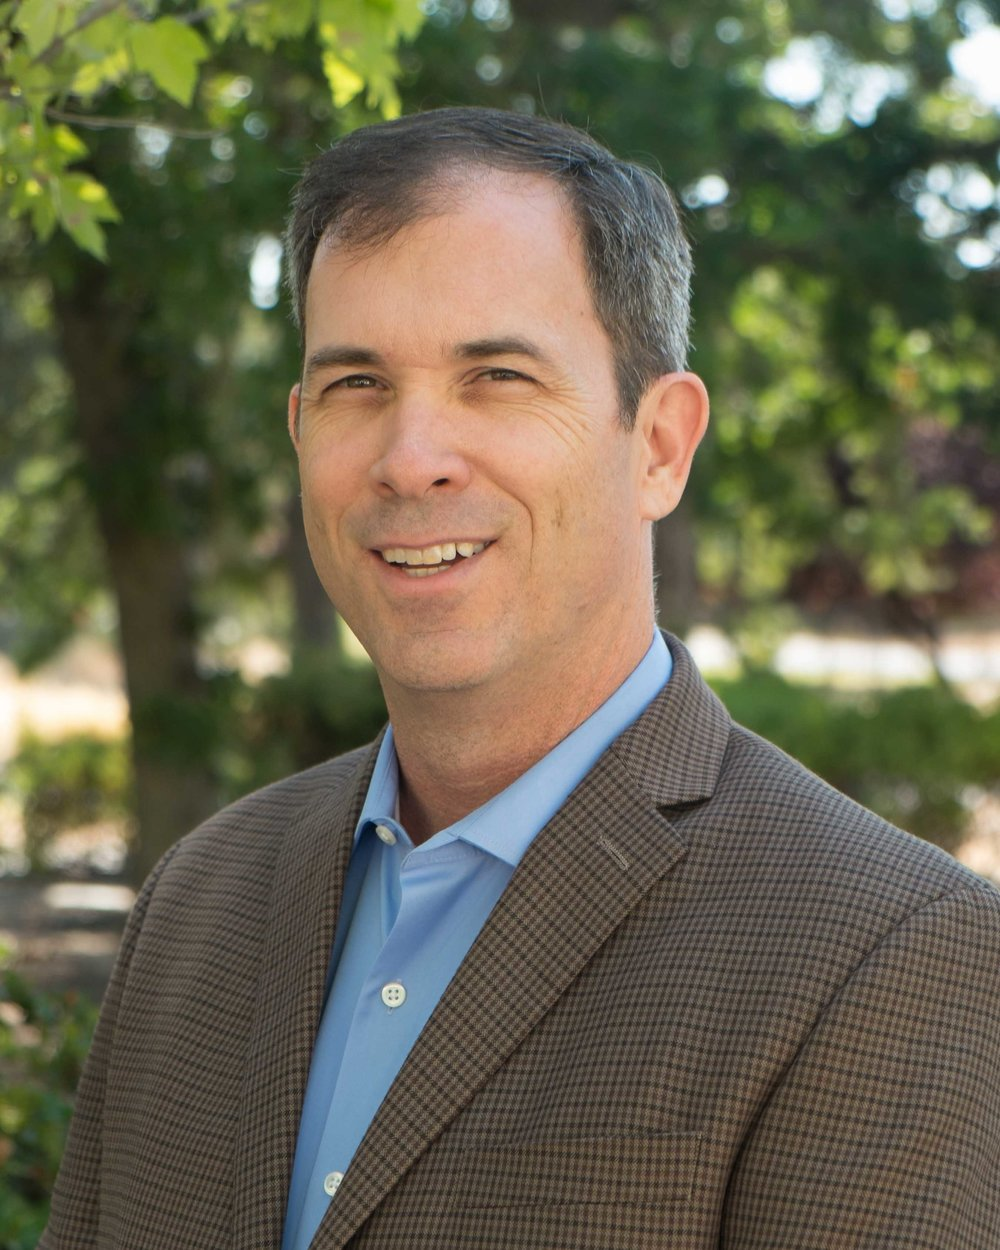 Jim Pfeifer